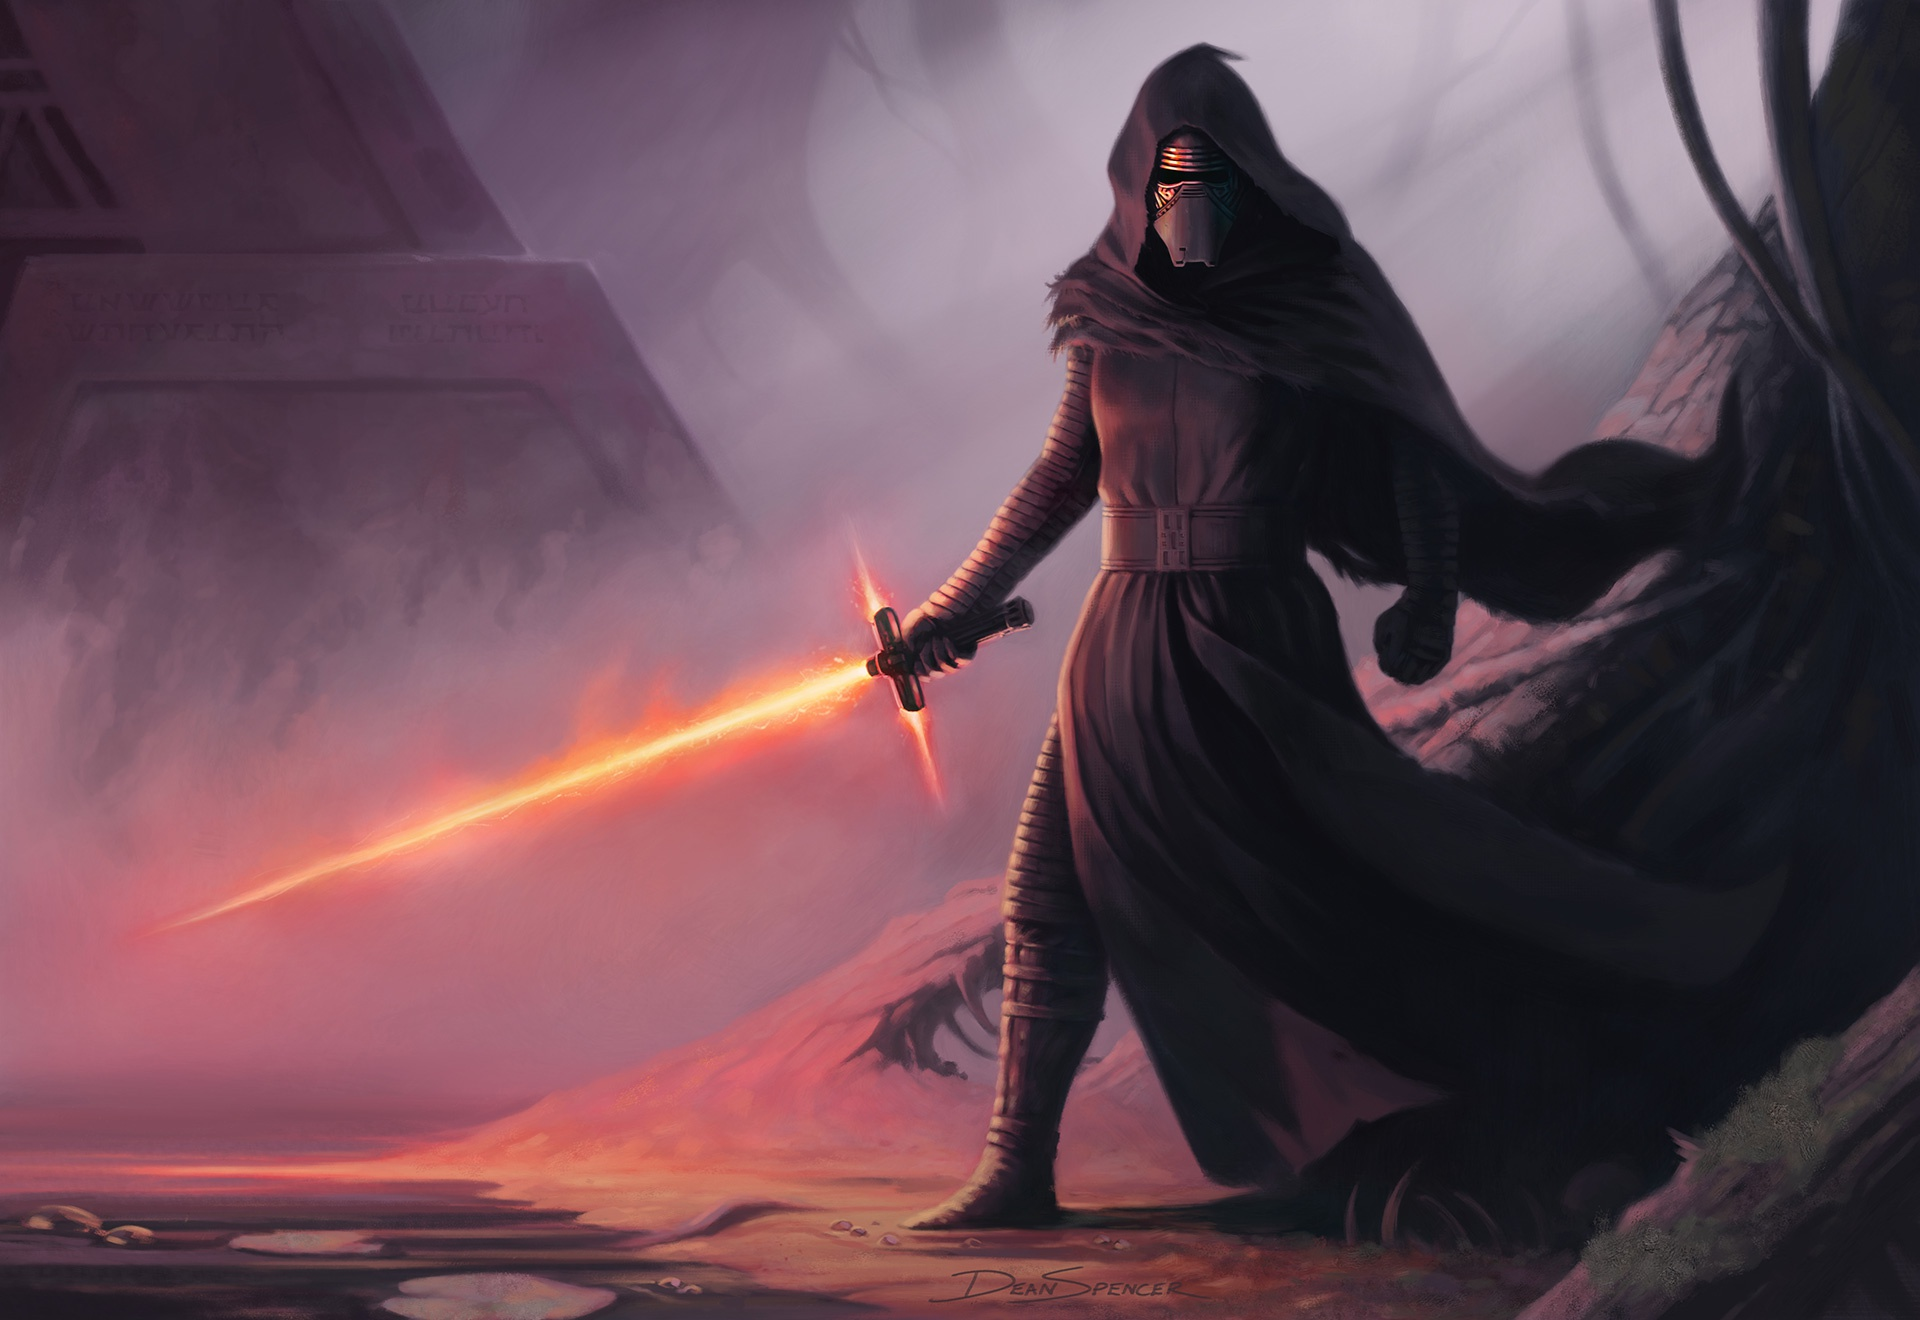 General 1920x1320 Star Wars Kylo Ren lightsaber artwork